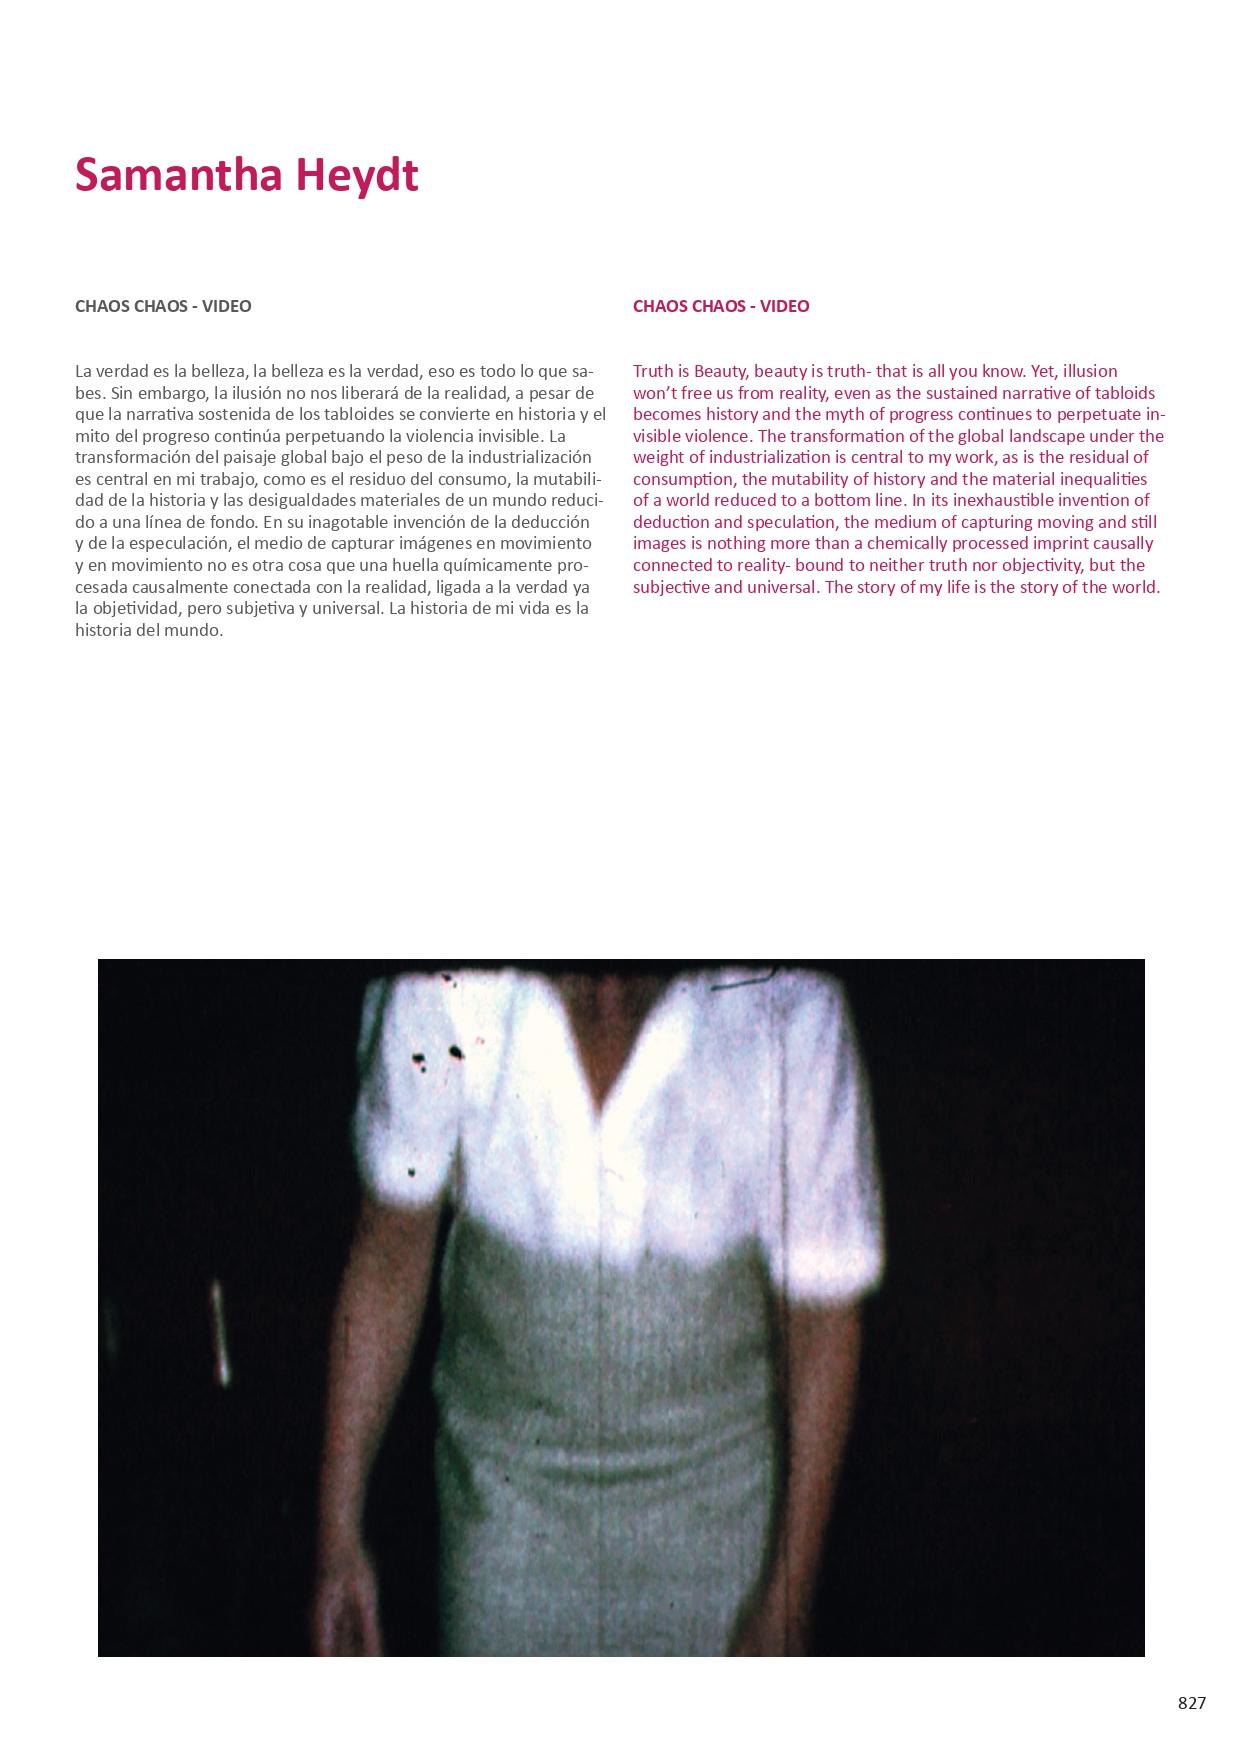 Encuentro Impact 10 Digital_page-0005.jpg